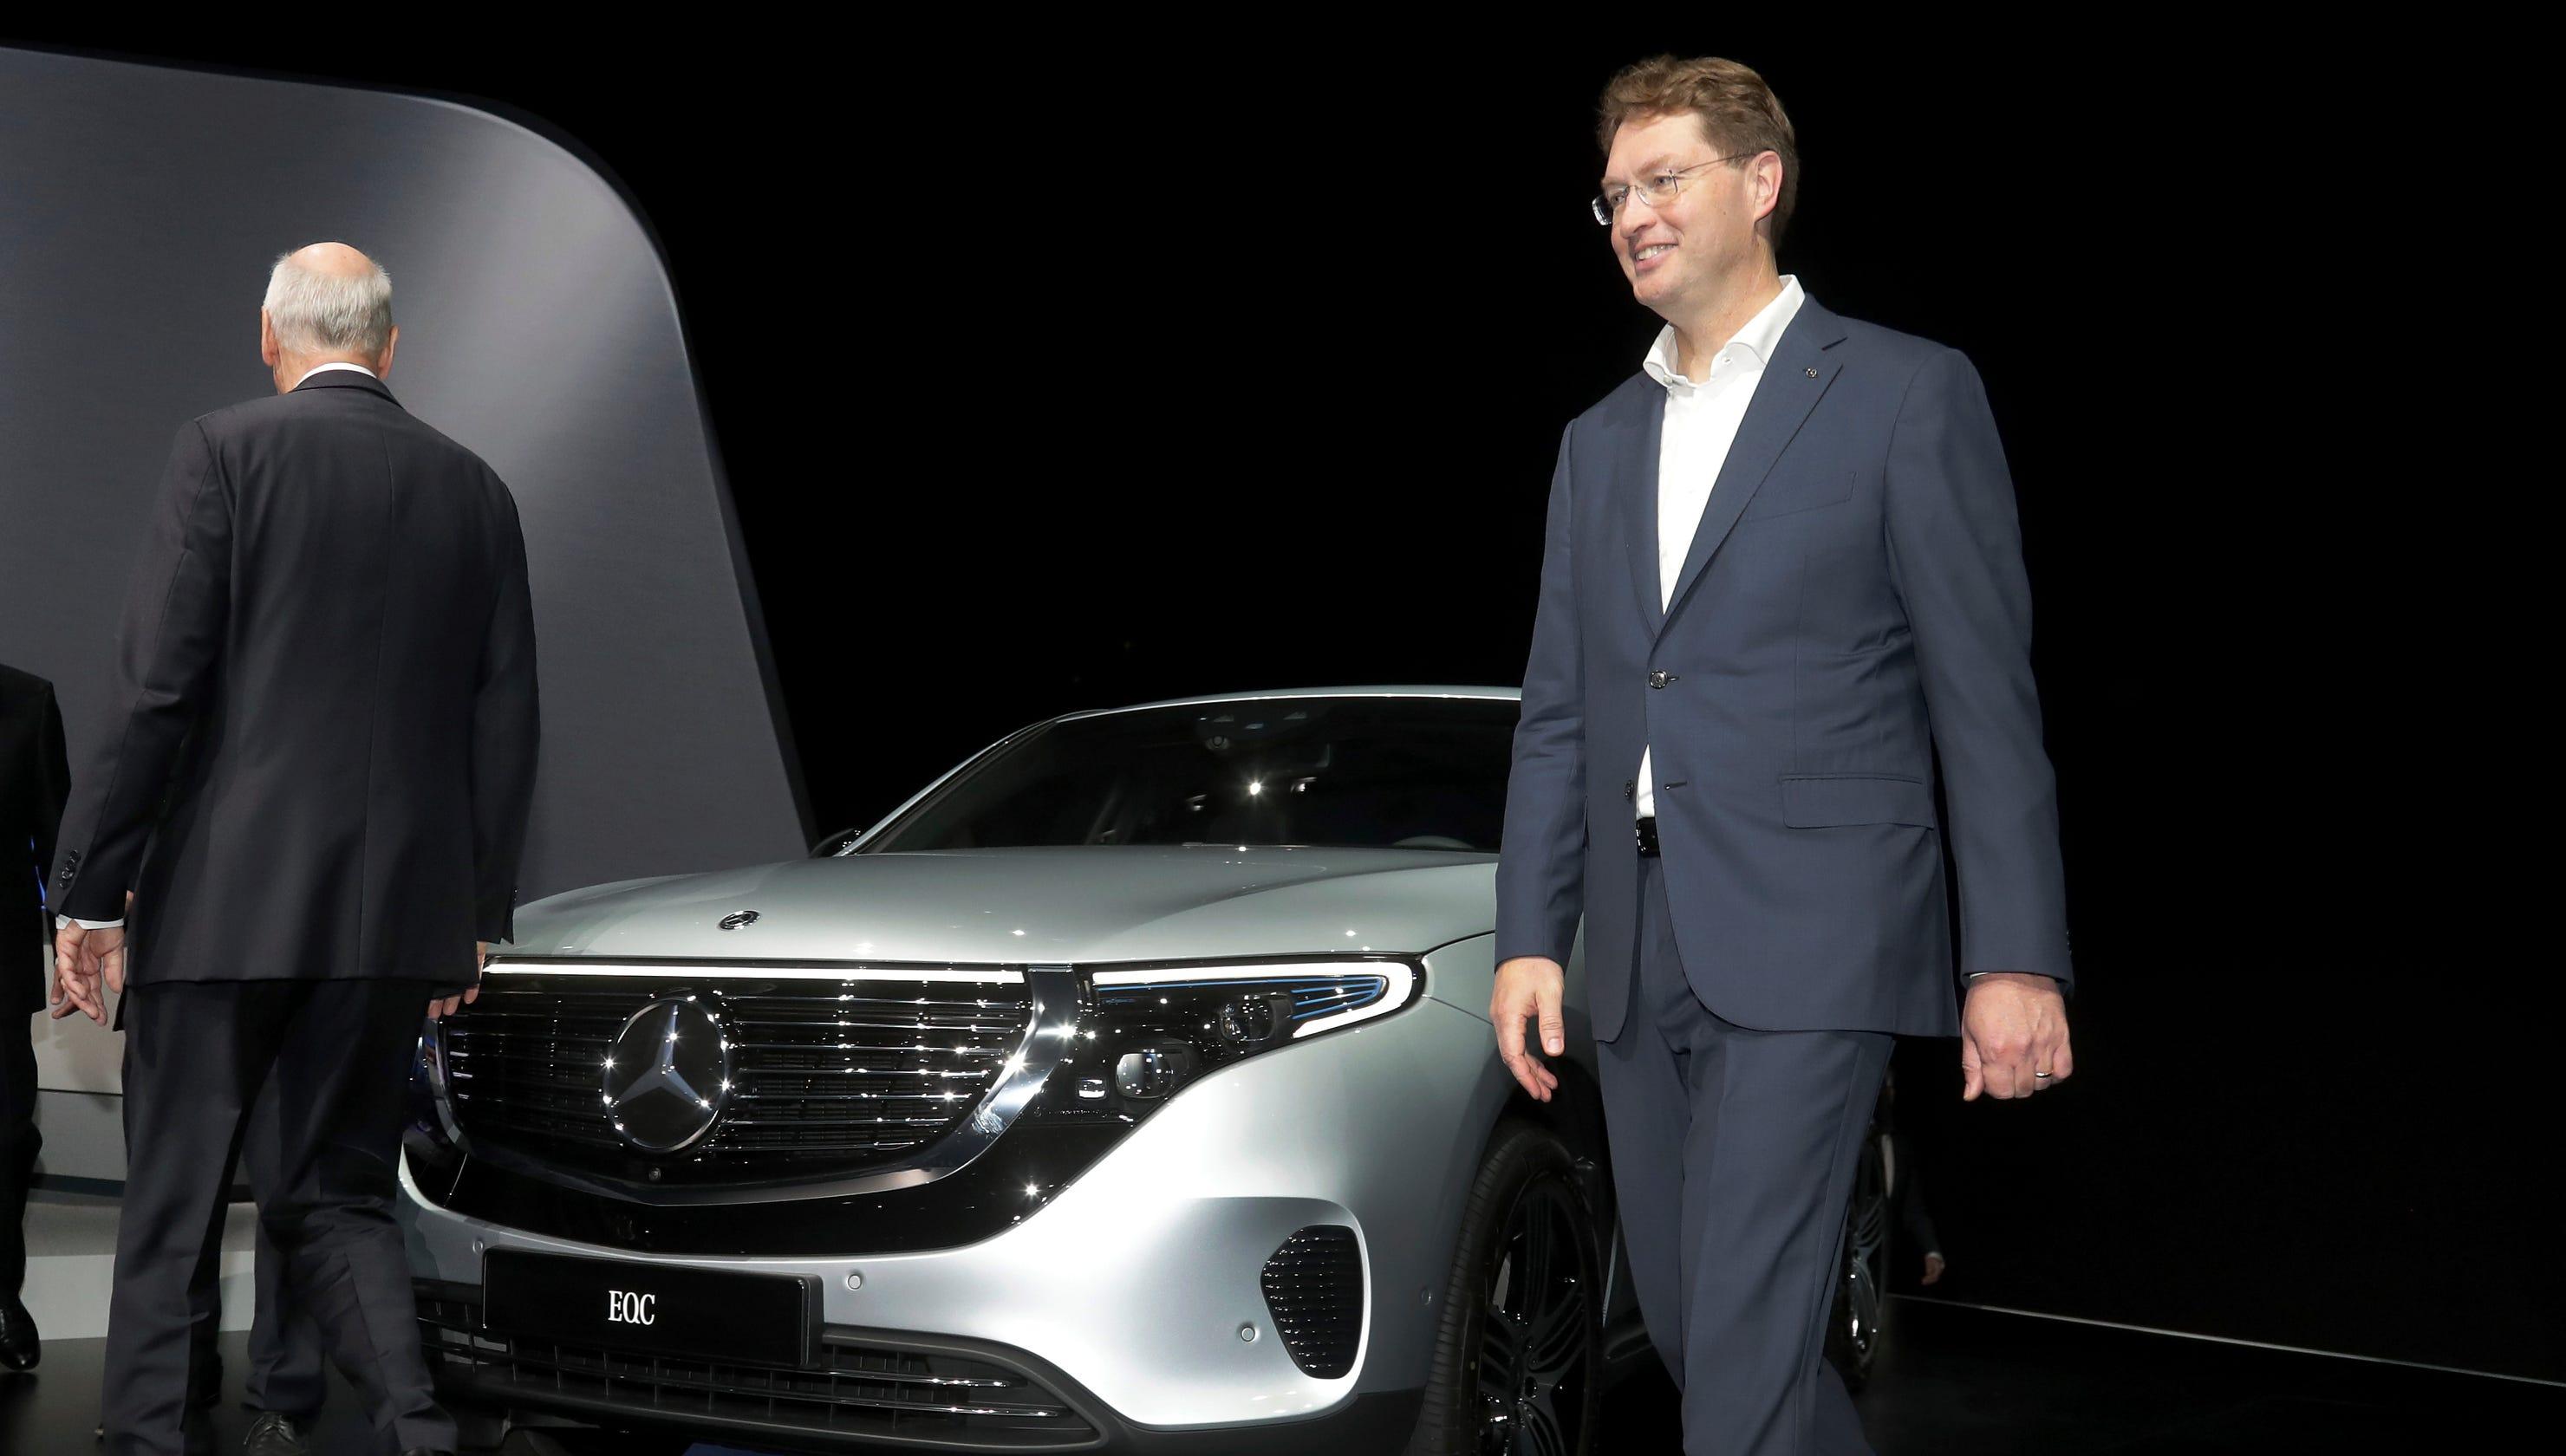 Daimler CEO Zetsche hands off to successor amid tech change